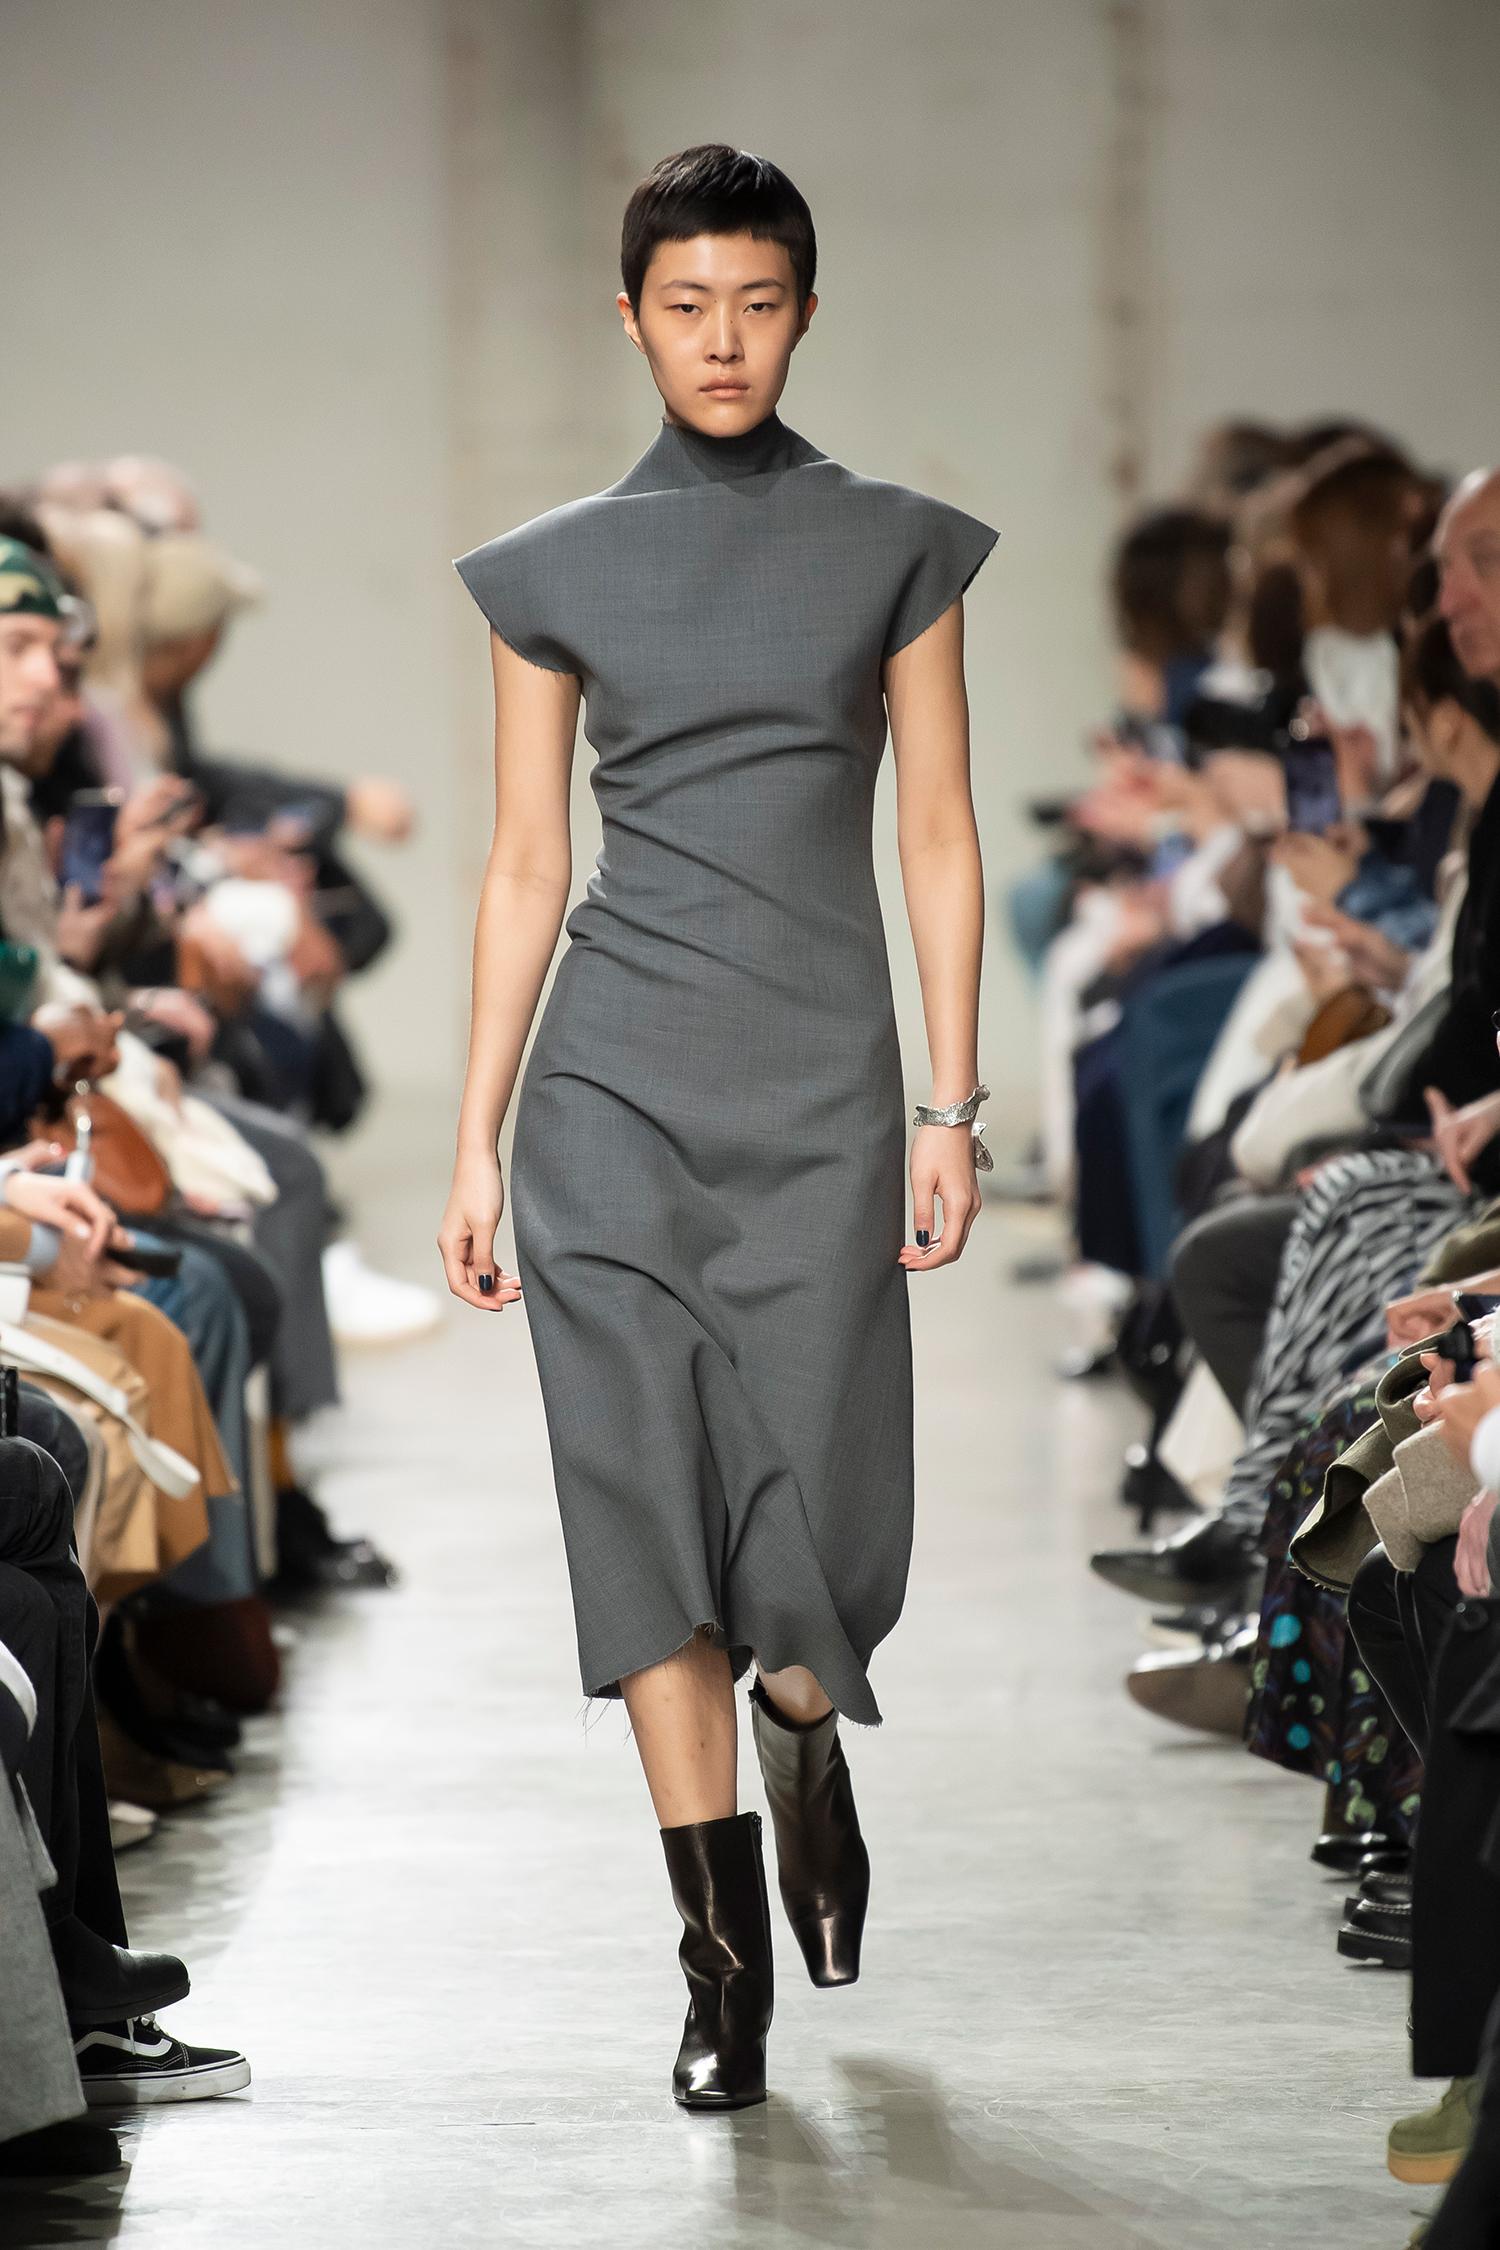 LOOK 25 Dress ROZINNE